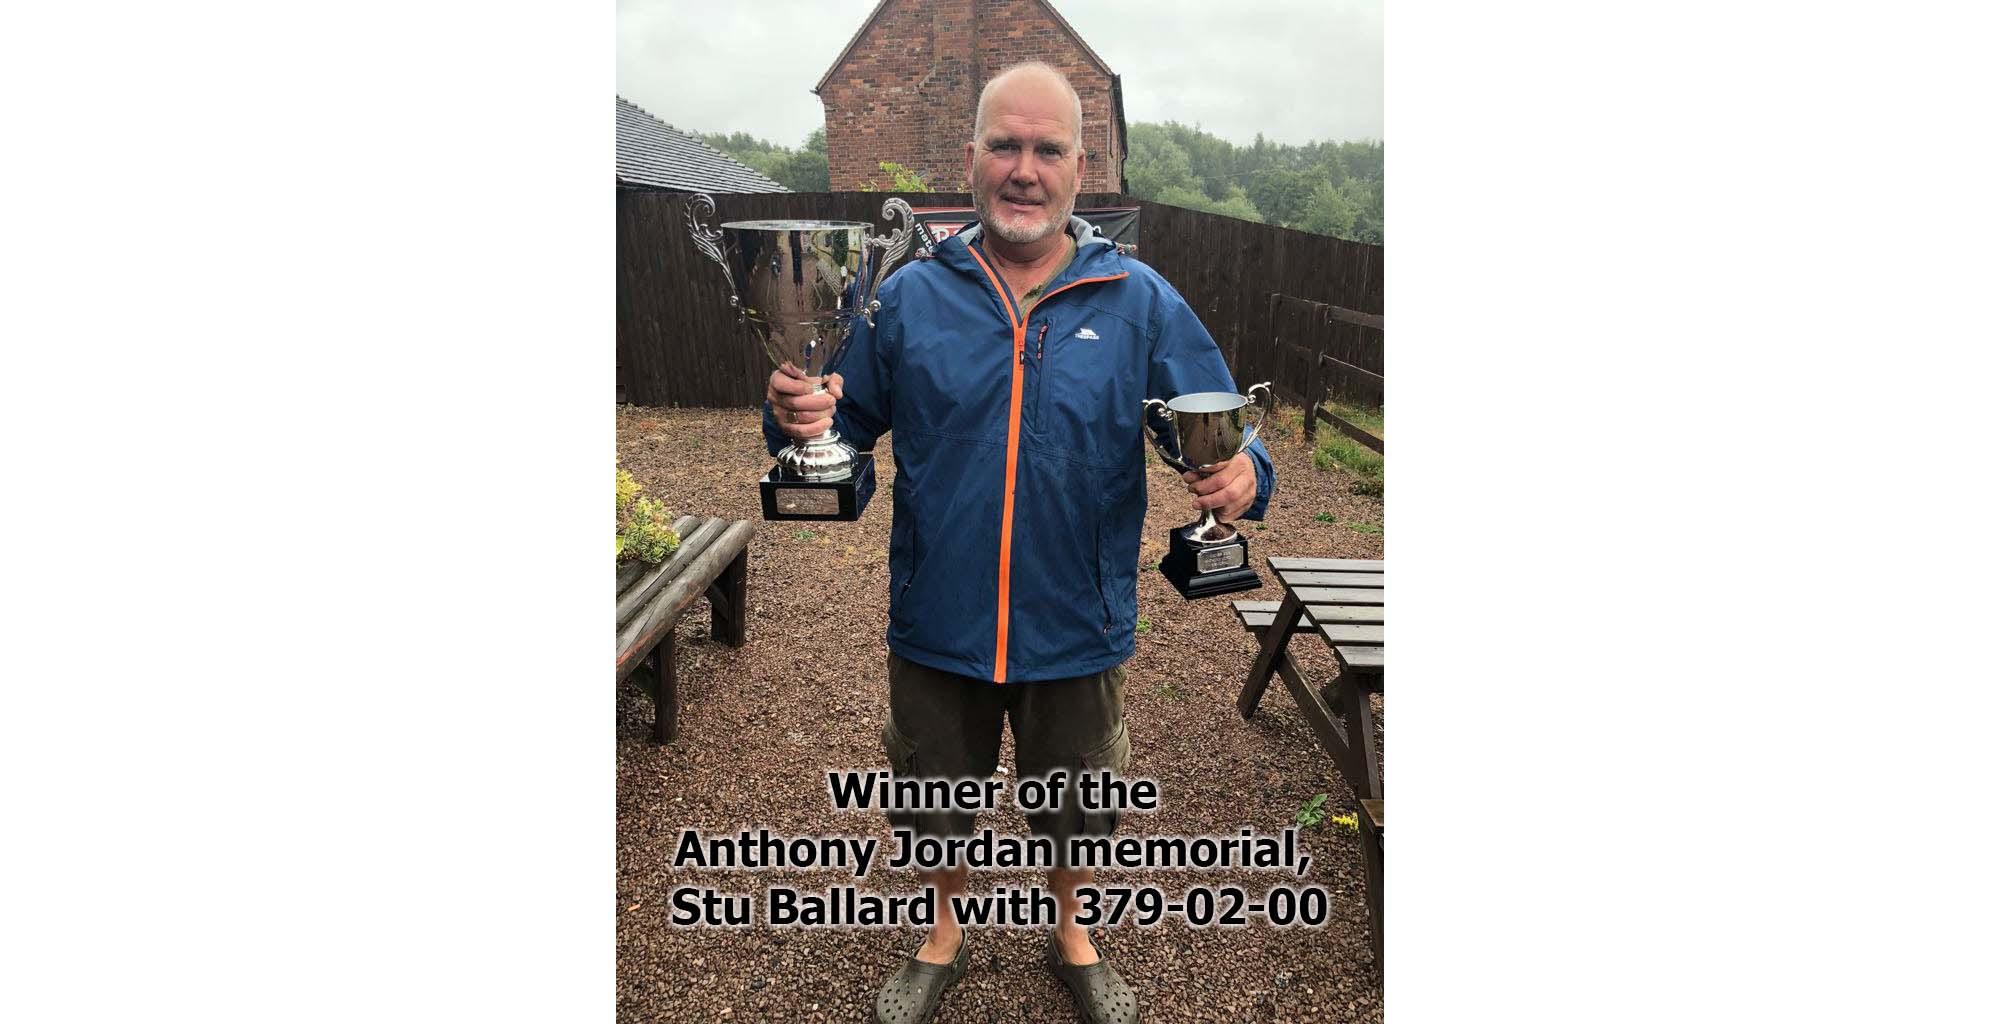 Anthony Jordan winner 2018-08-11 Stu Ballard txt